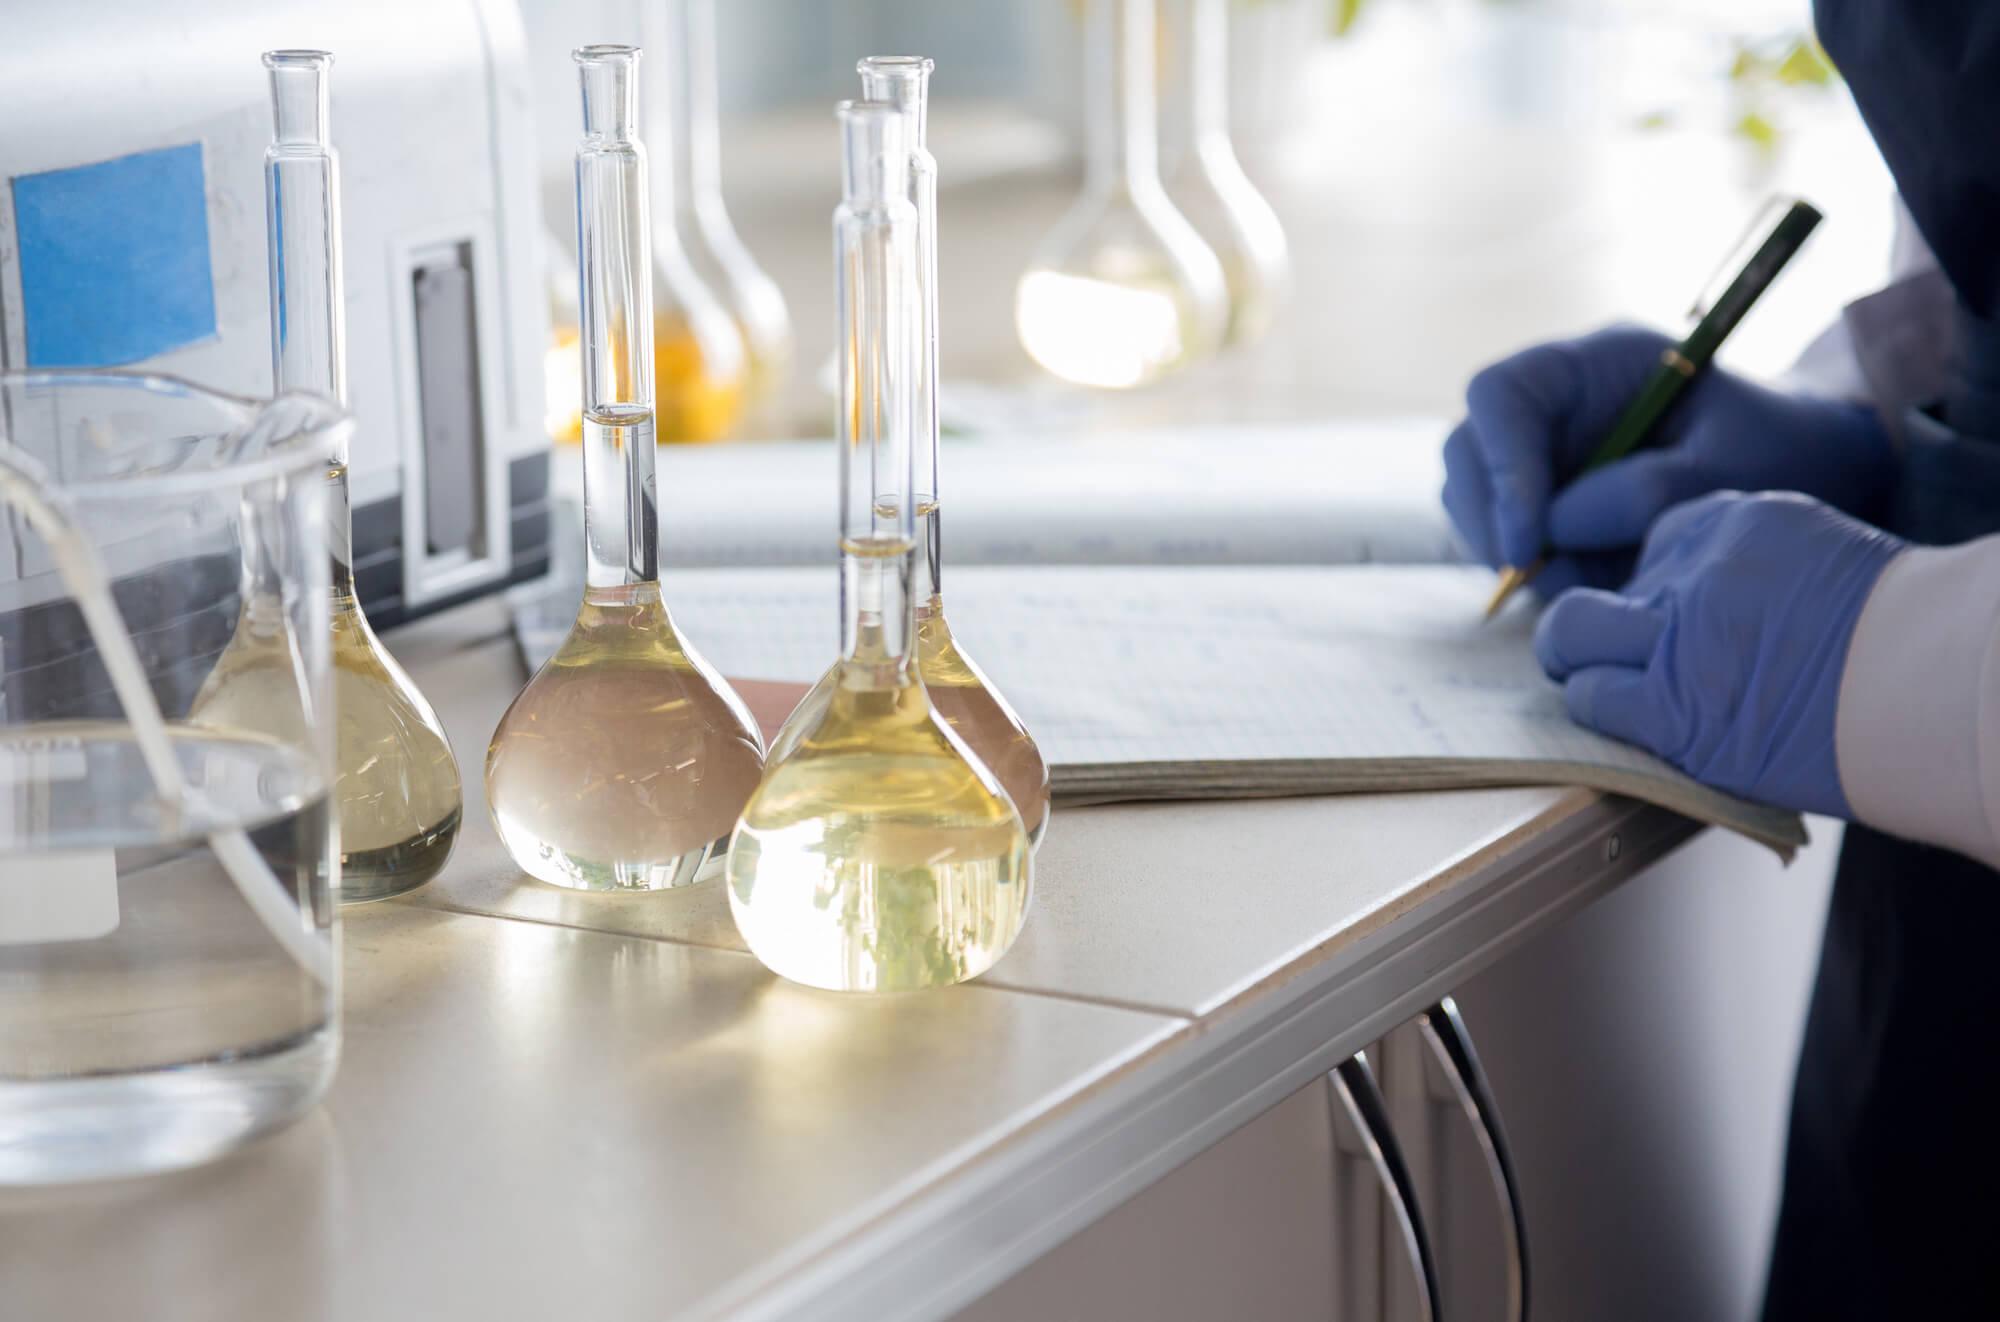 tecnologia em lubrificantes P&D